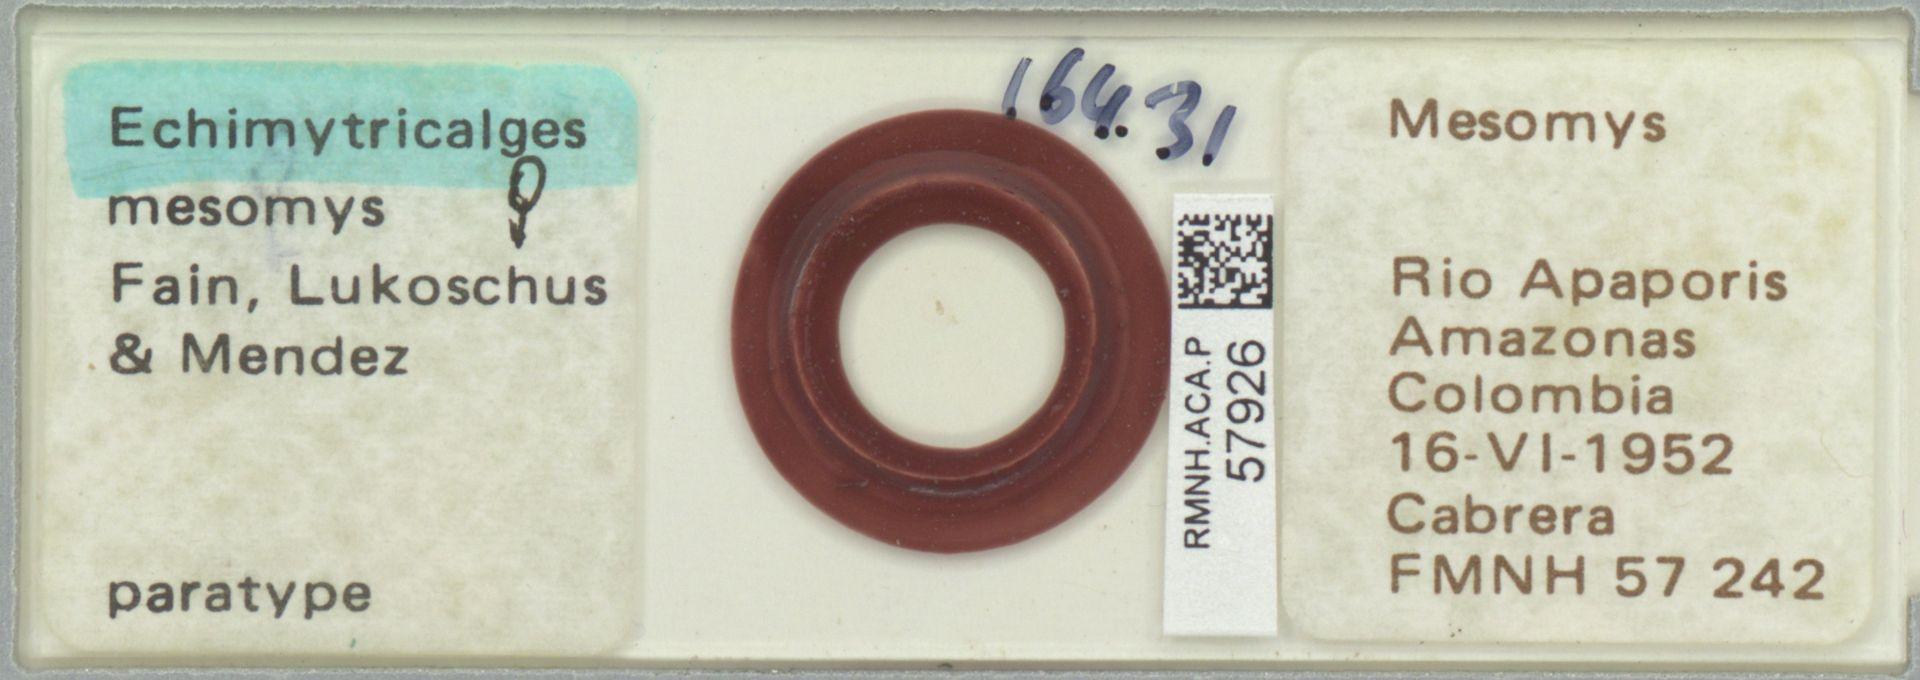 RMNH.ACA.P.57926 | Echimytricalges mesomys Fain, Lukoschus & Mendez